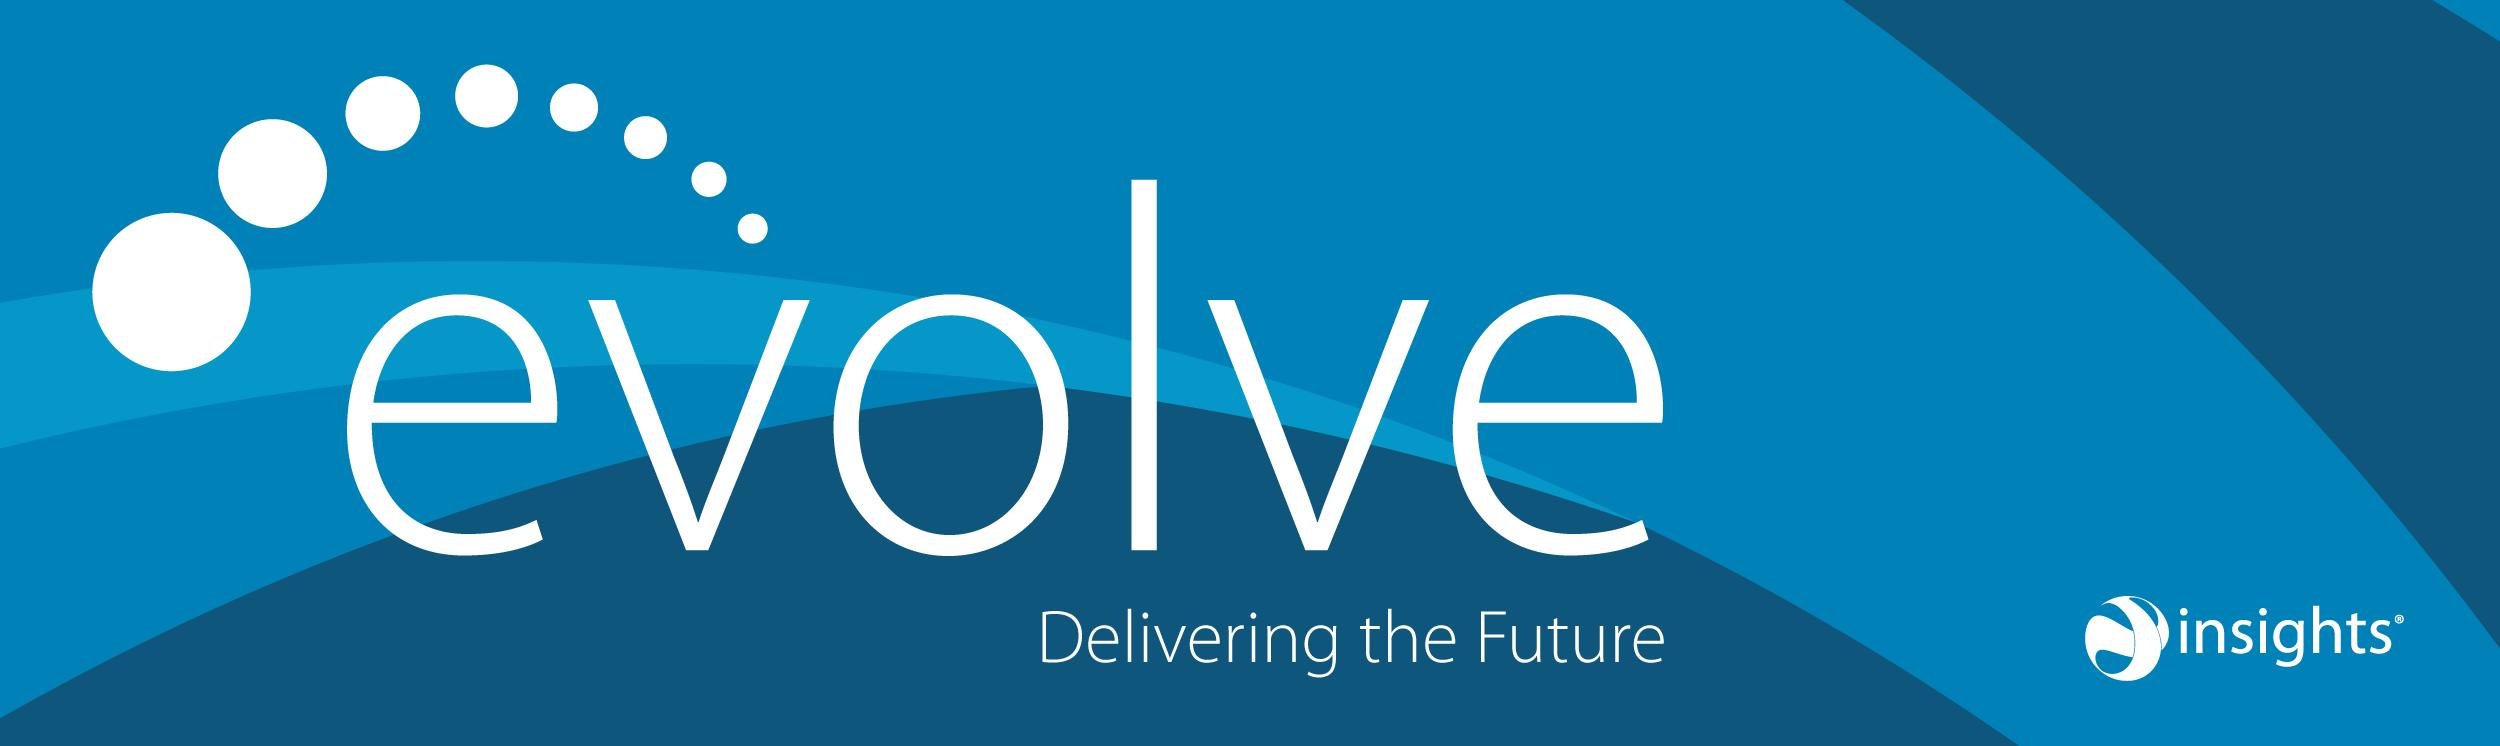 Evolve_email_banner_2016-01.png